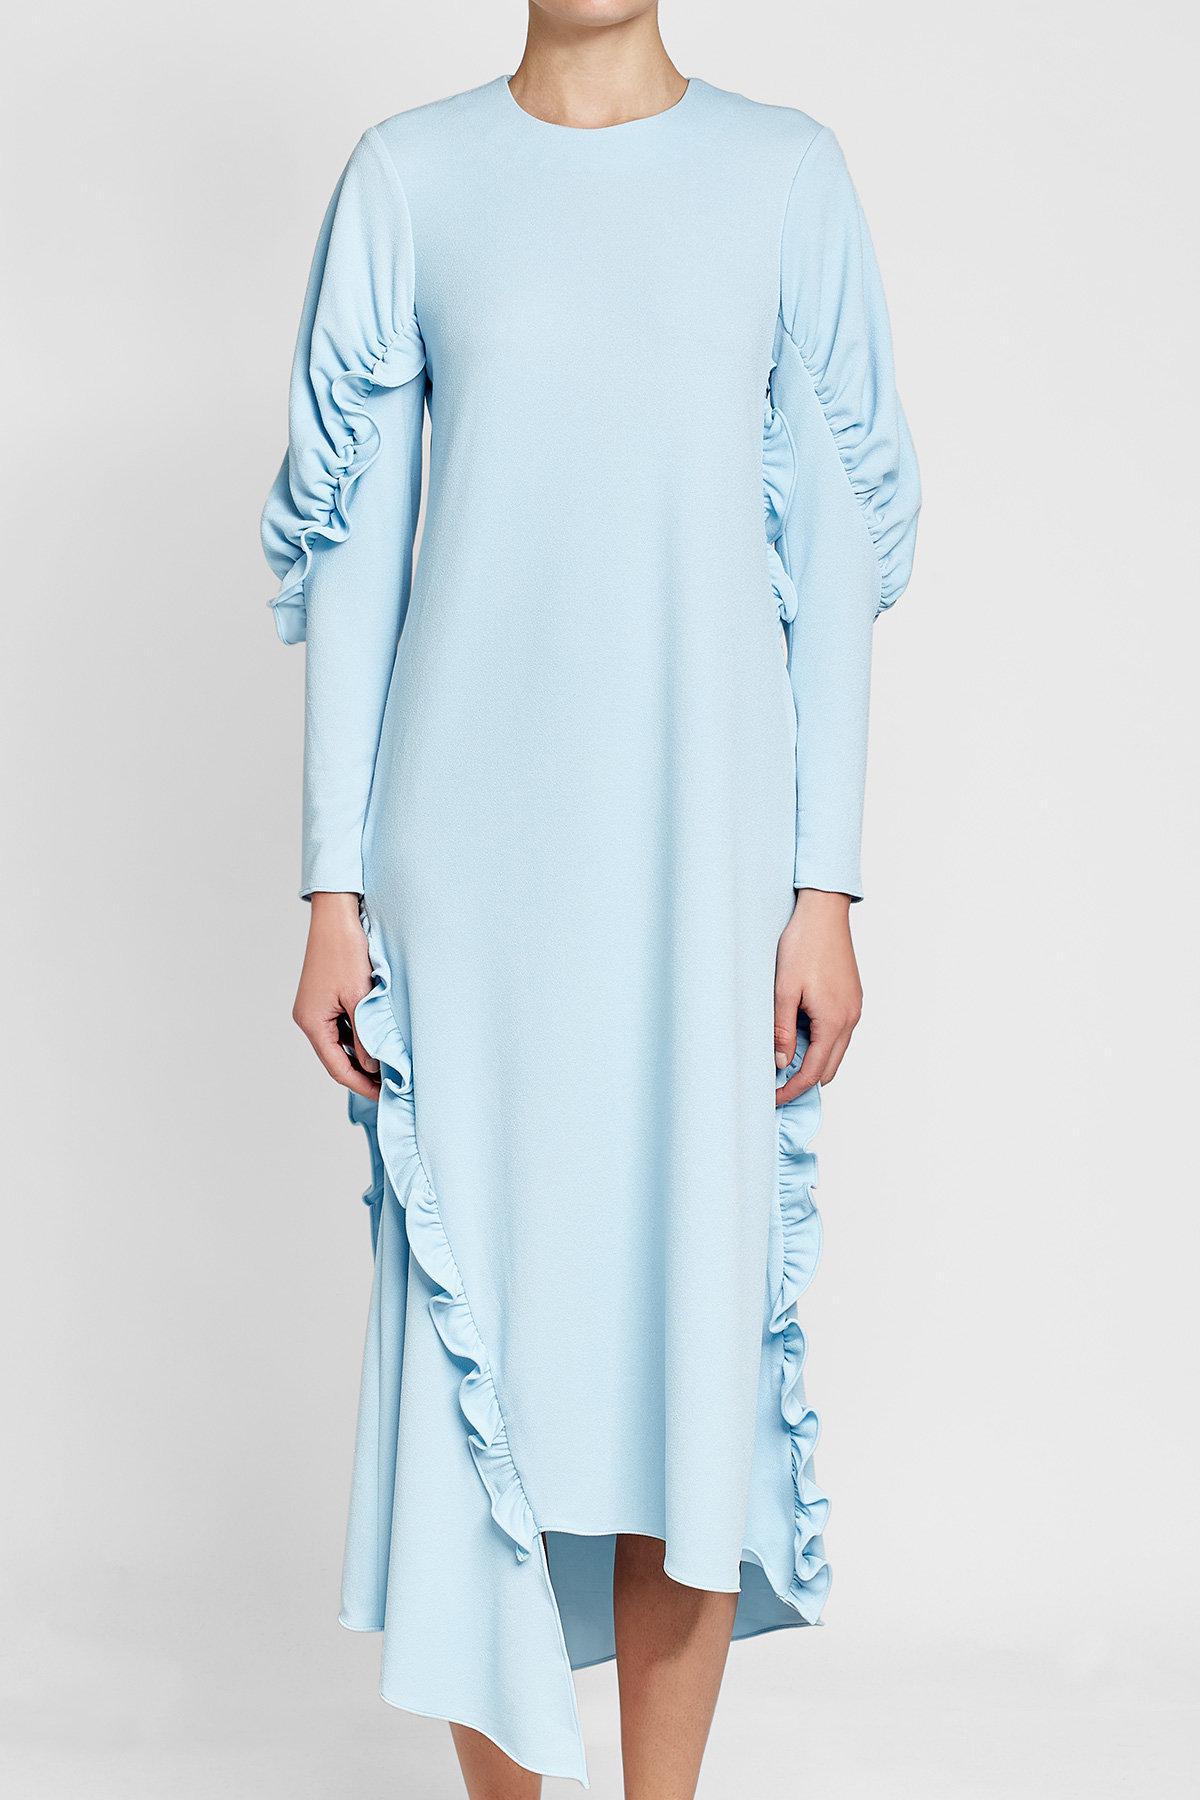 b81663efe9f Tibi - Blue Crepe Dress With Ruffles - Lyst. View fullscreen